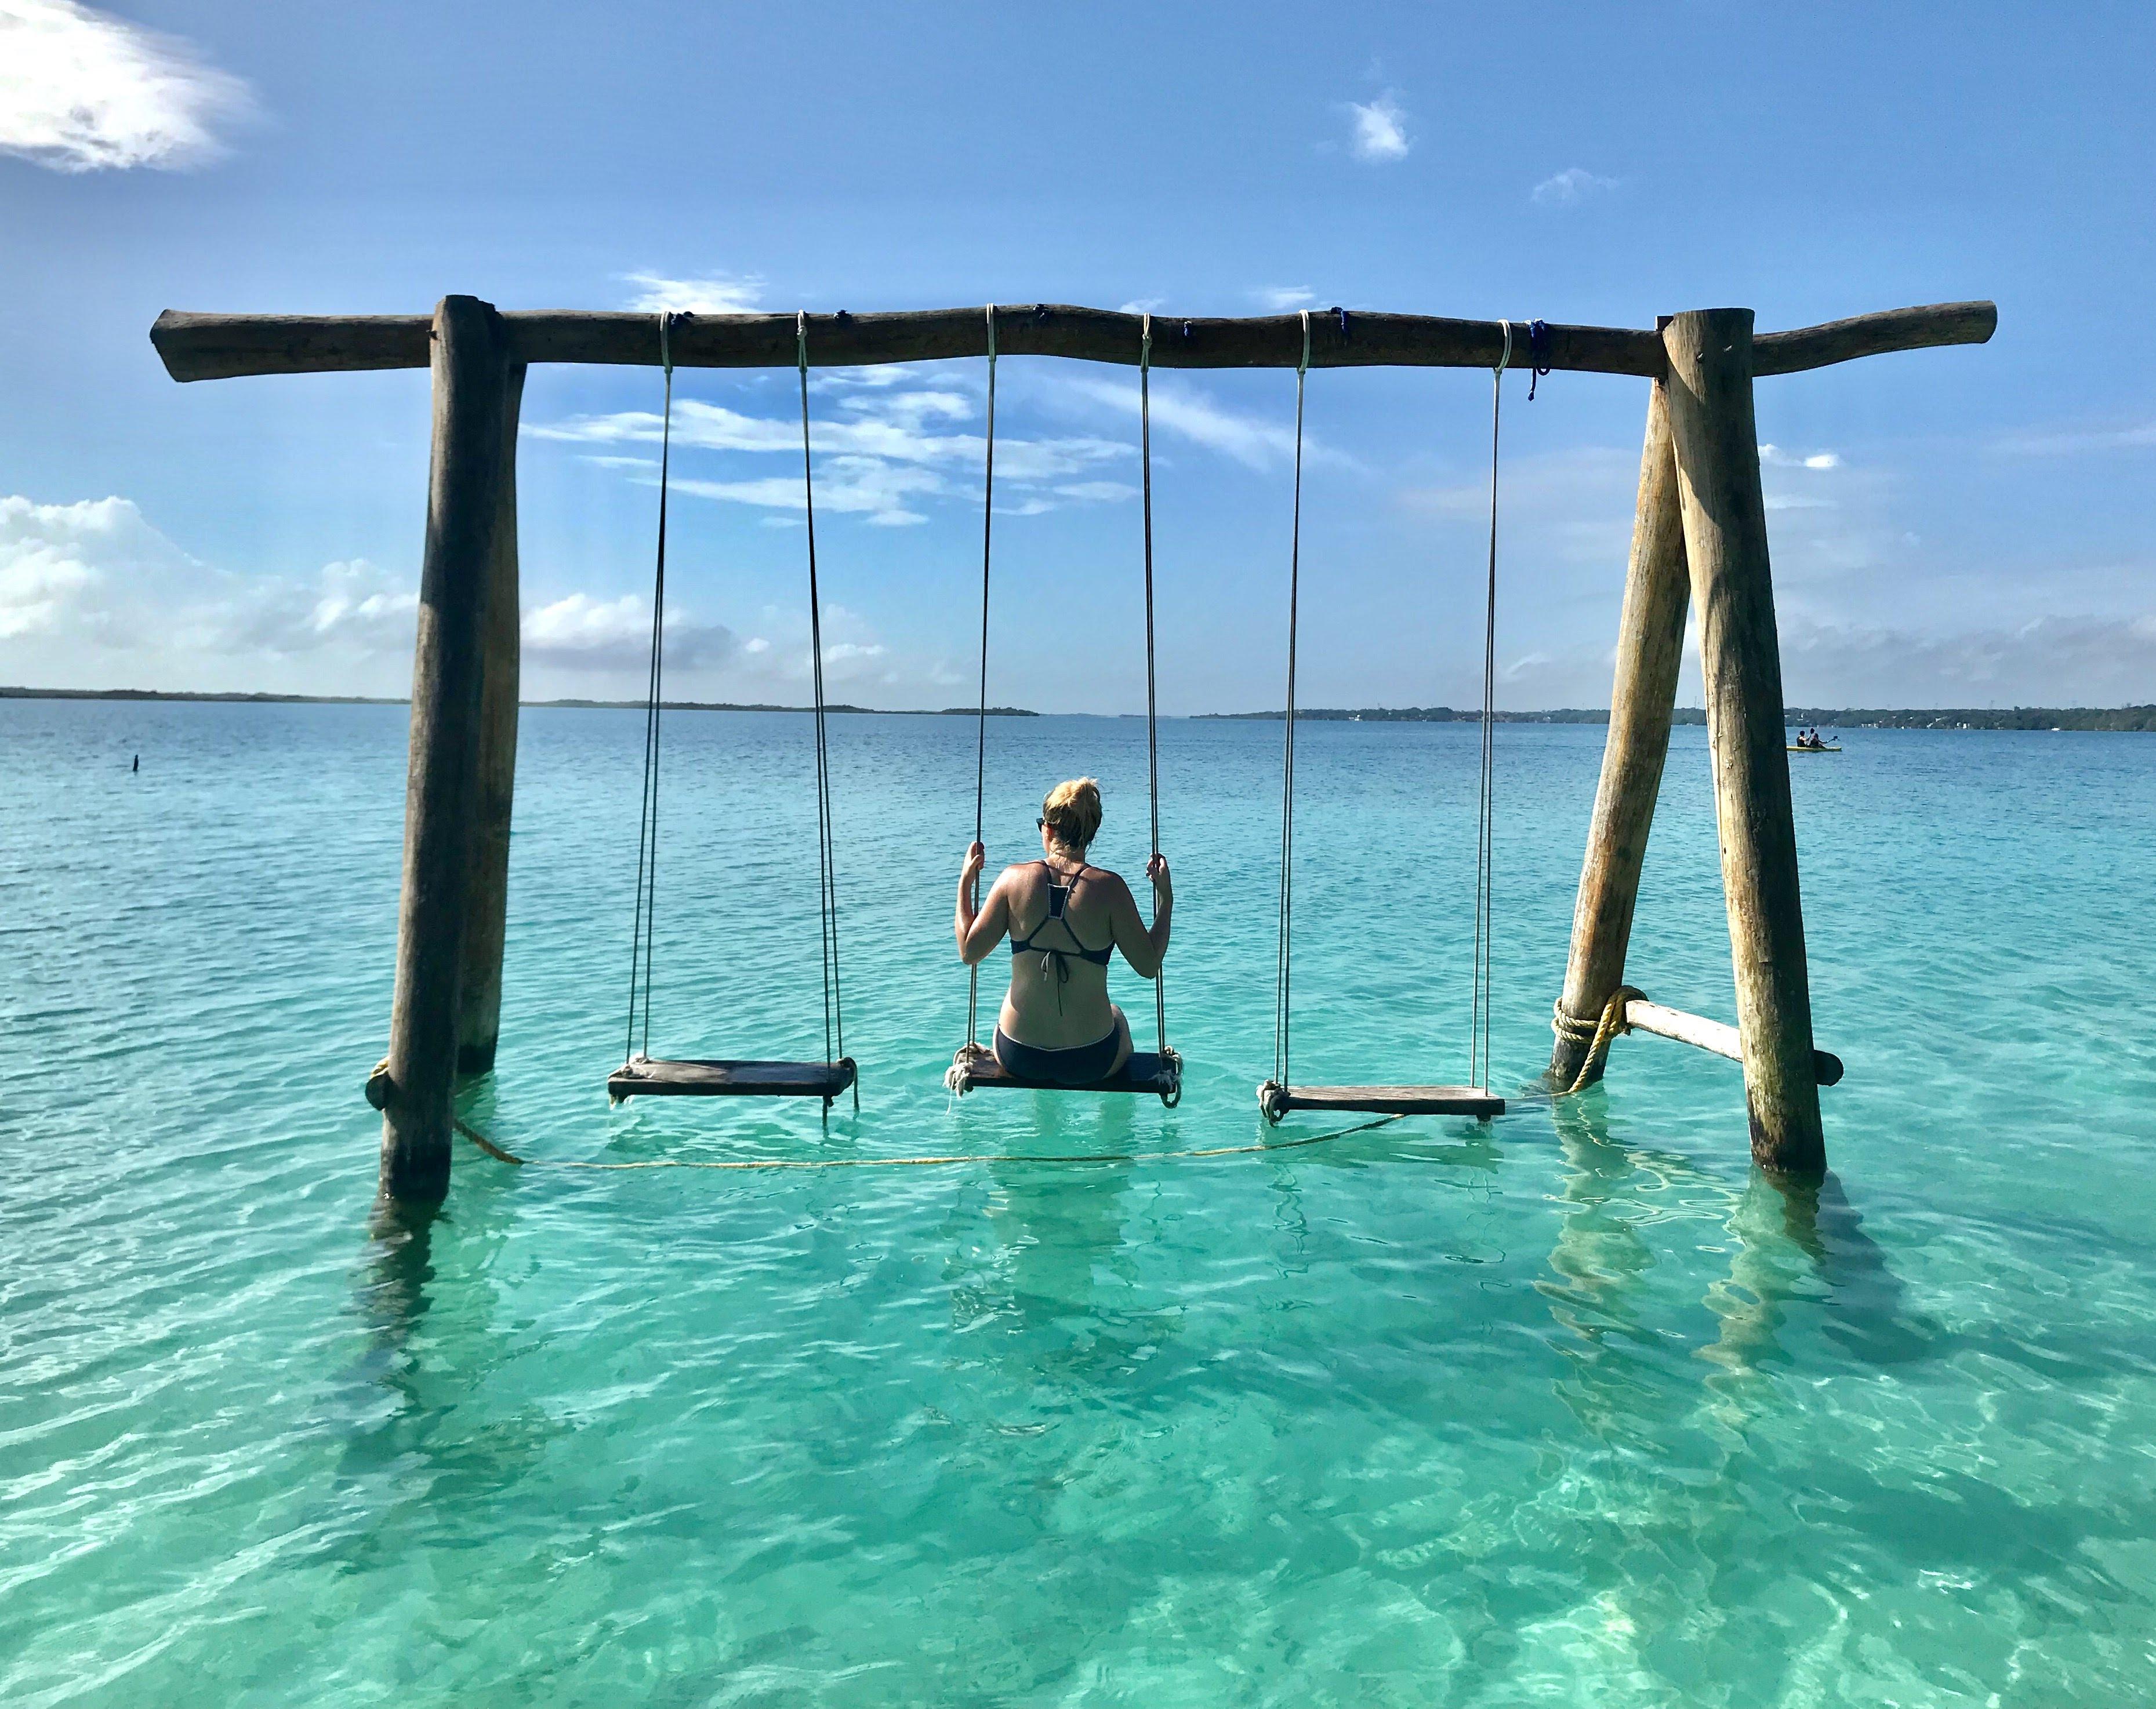 girl on water swings in laguna bacalar